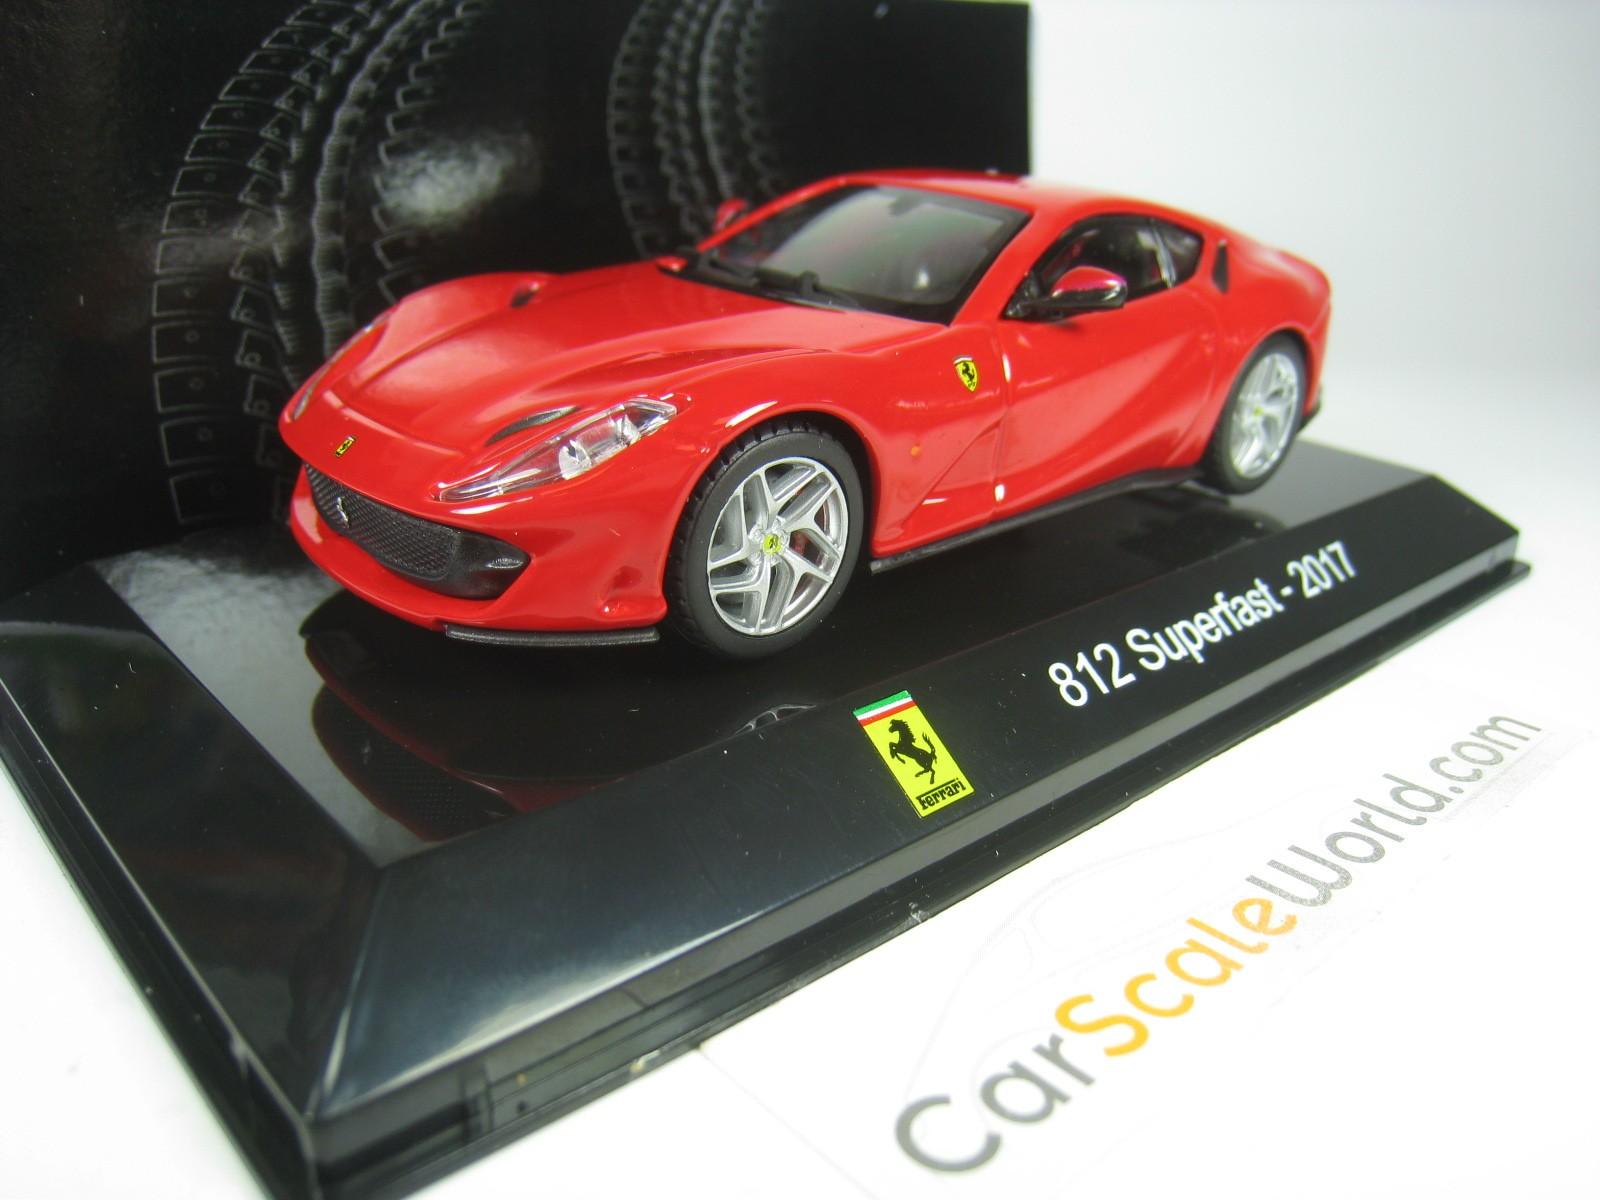 Ferrari 812 Superfast 2017 1:43 Ixo Salvat Diecast coche Supercar